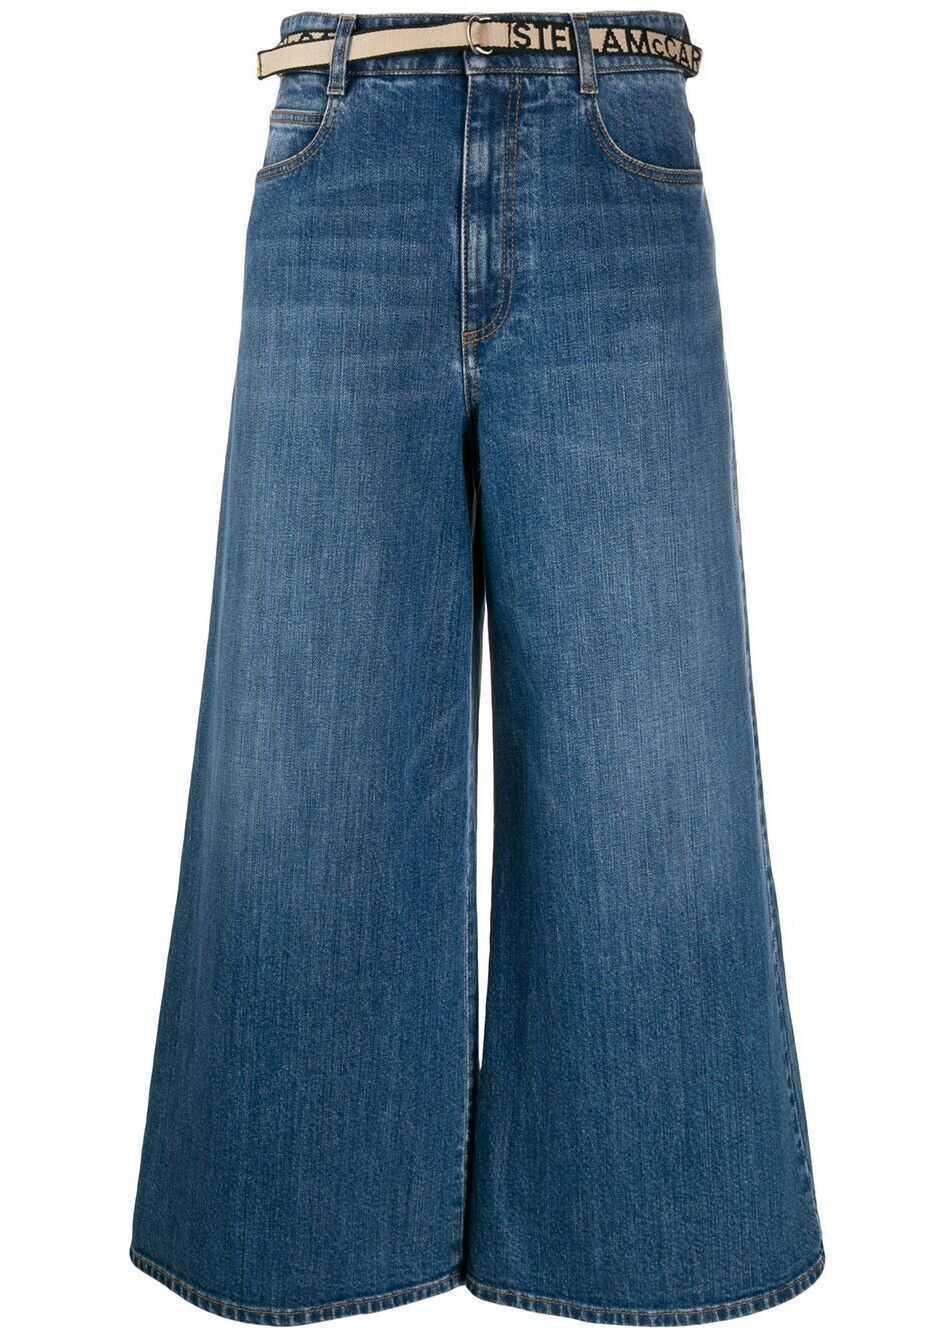 adidas by Stella McCartney Cotton Jeans BLUE